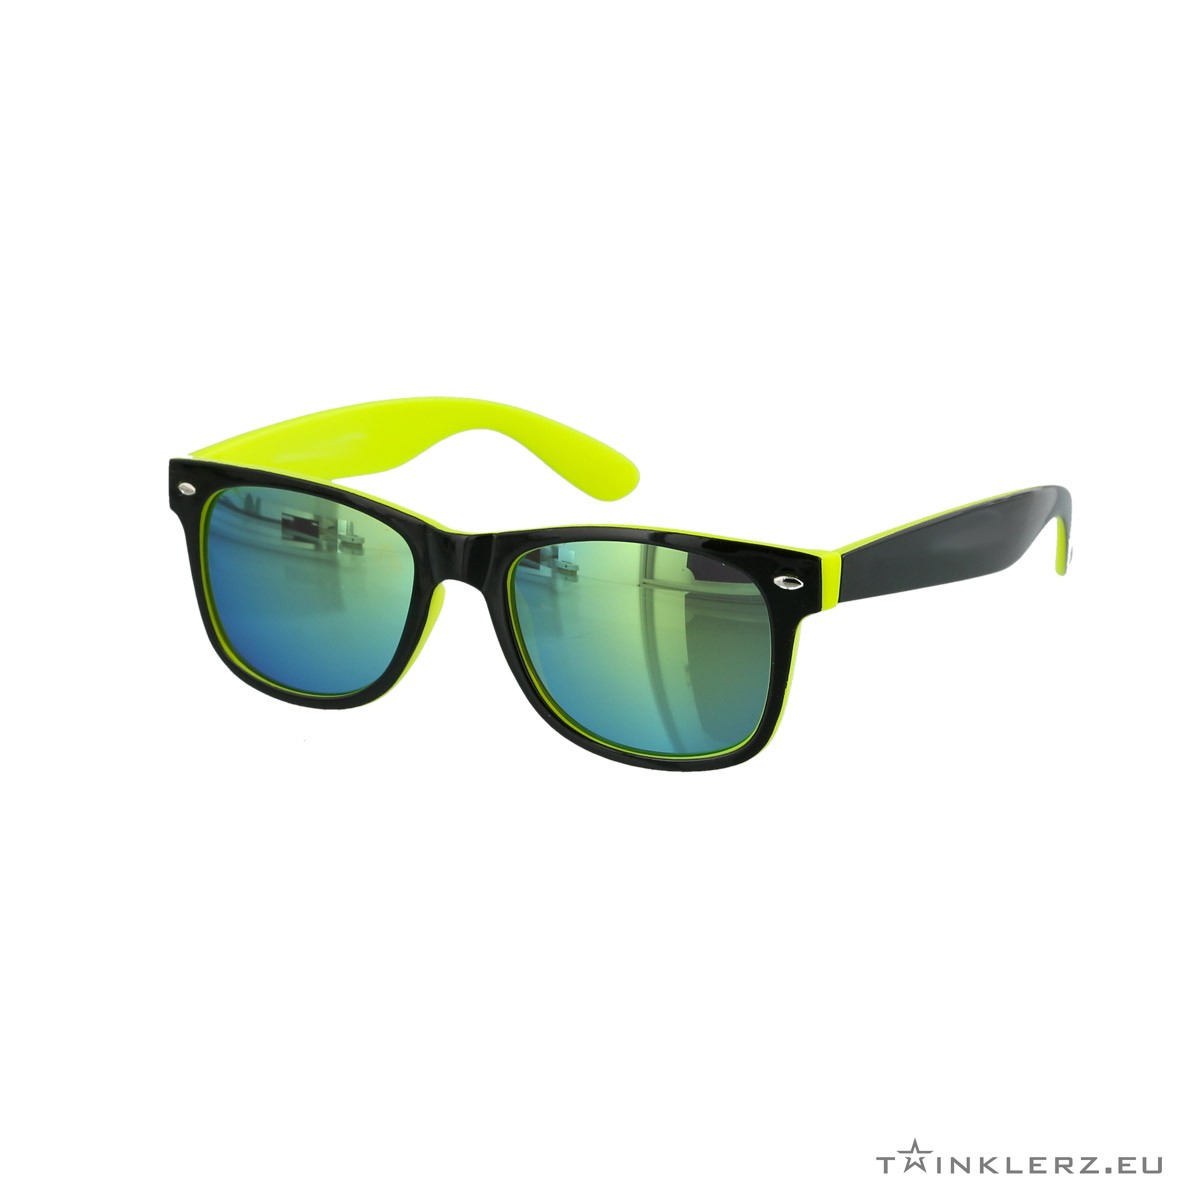 Two tone wayfarer sunglasses black, yellow - blue, green mirror glasses